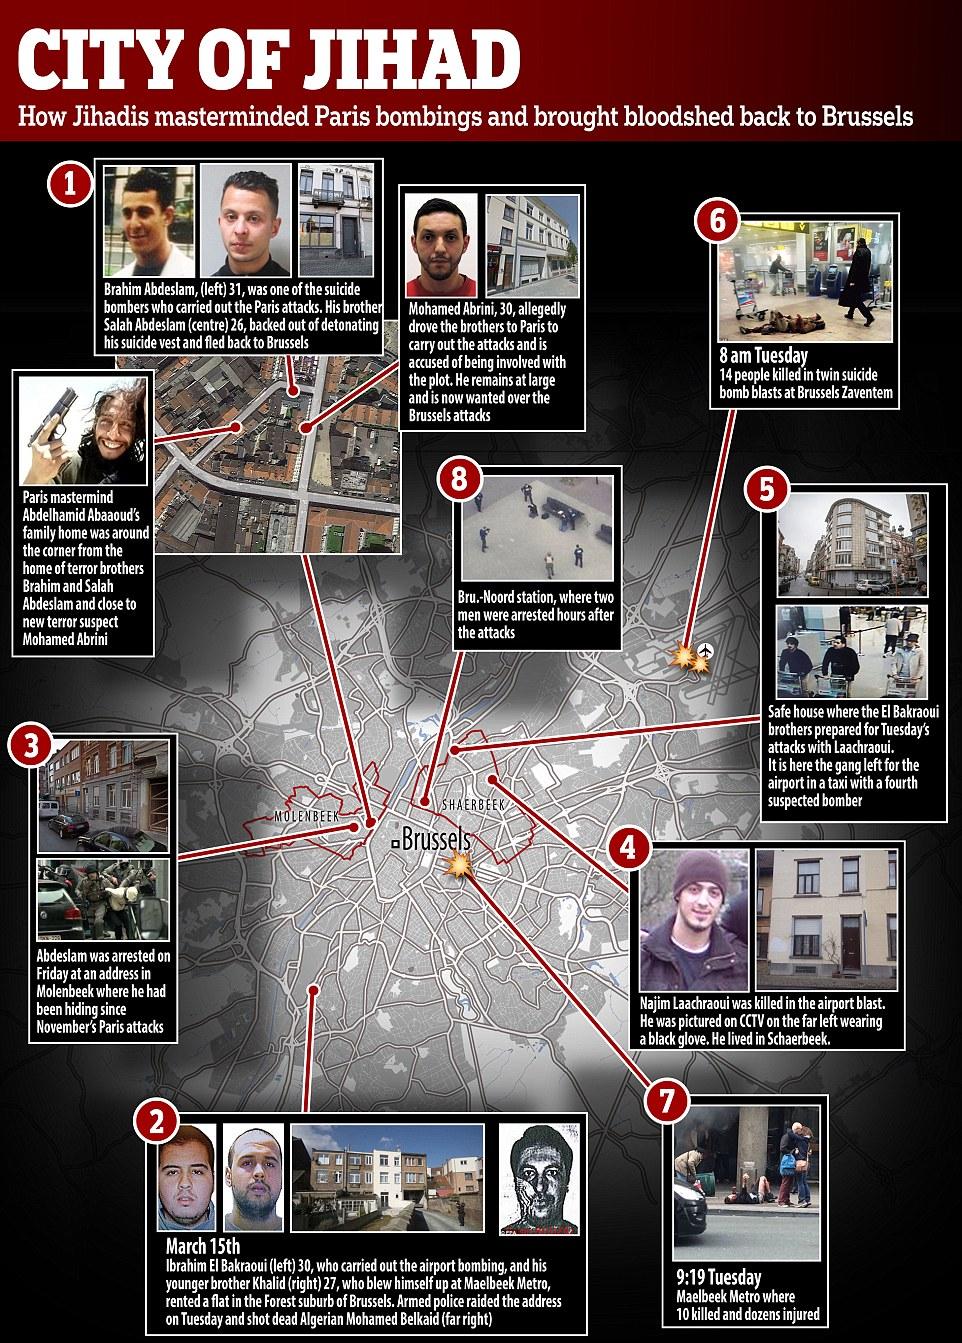 City of jihad